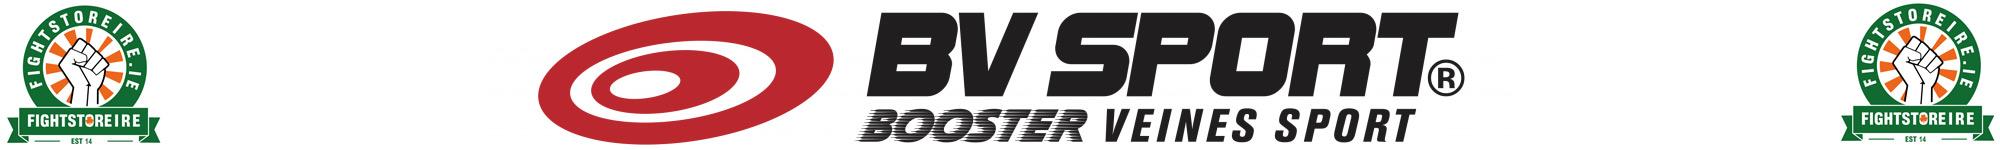 BV Sport from Fightstore Ireland